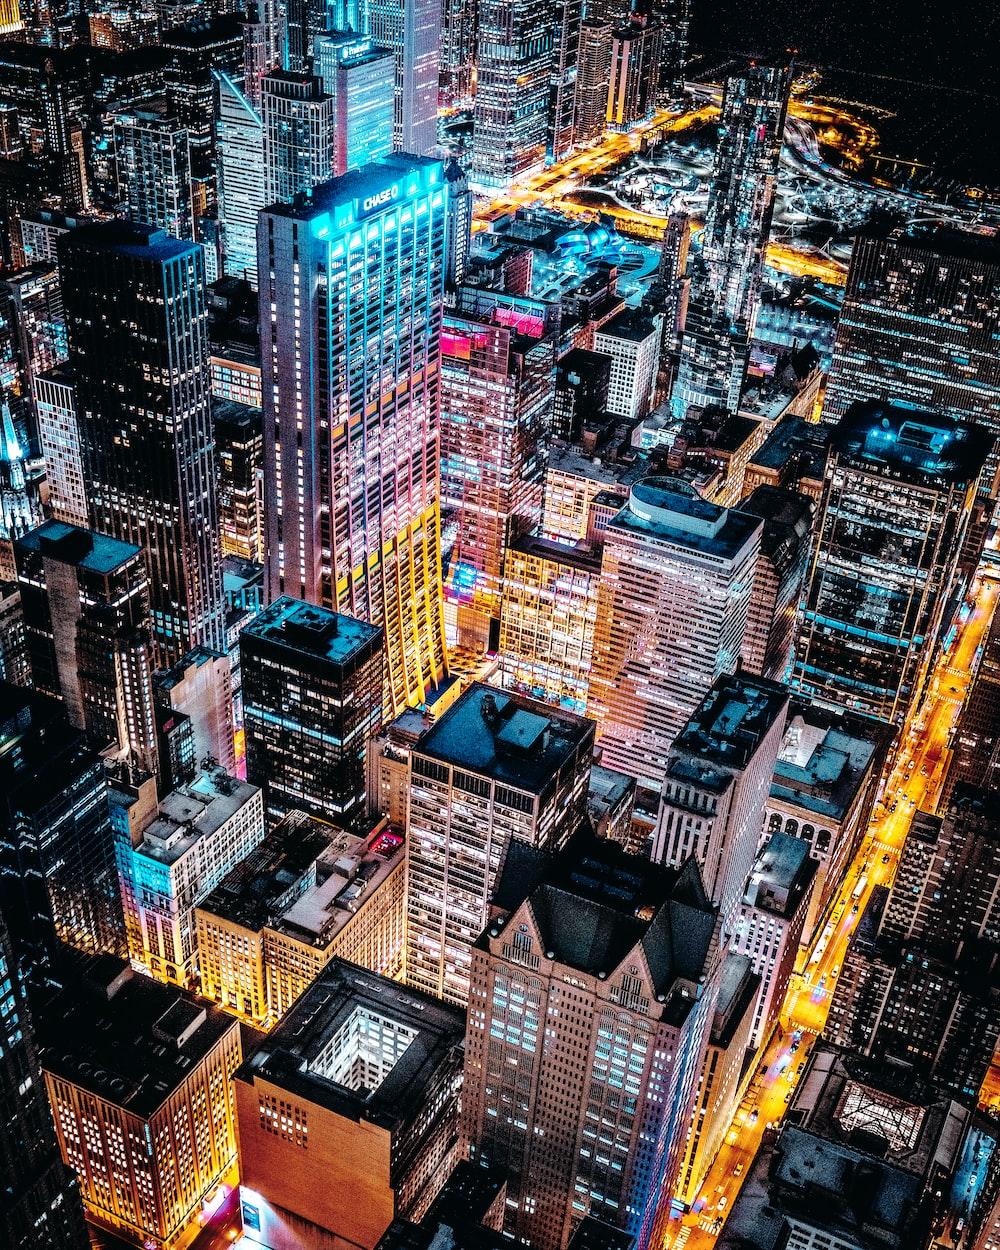 aerial photo of concrete buildings